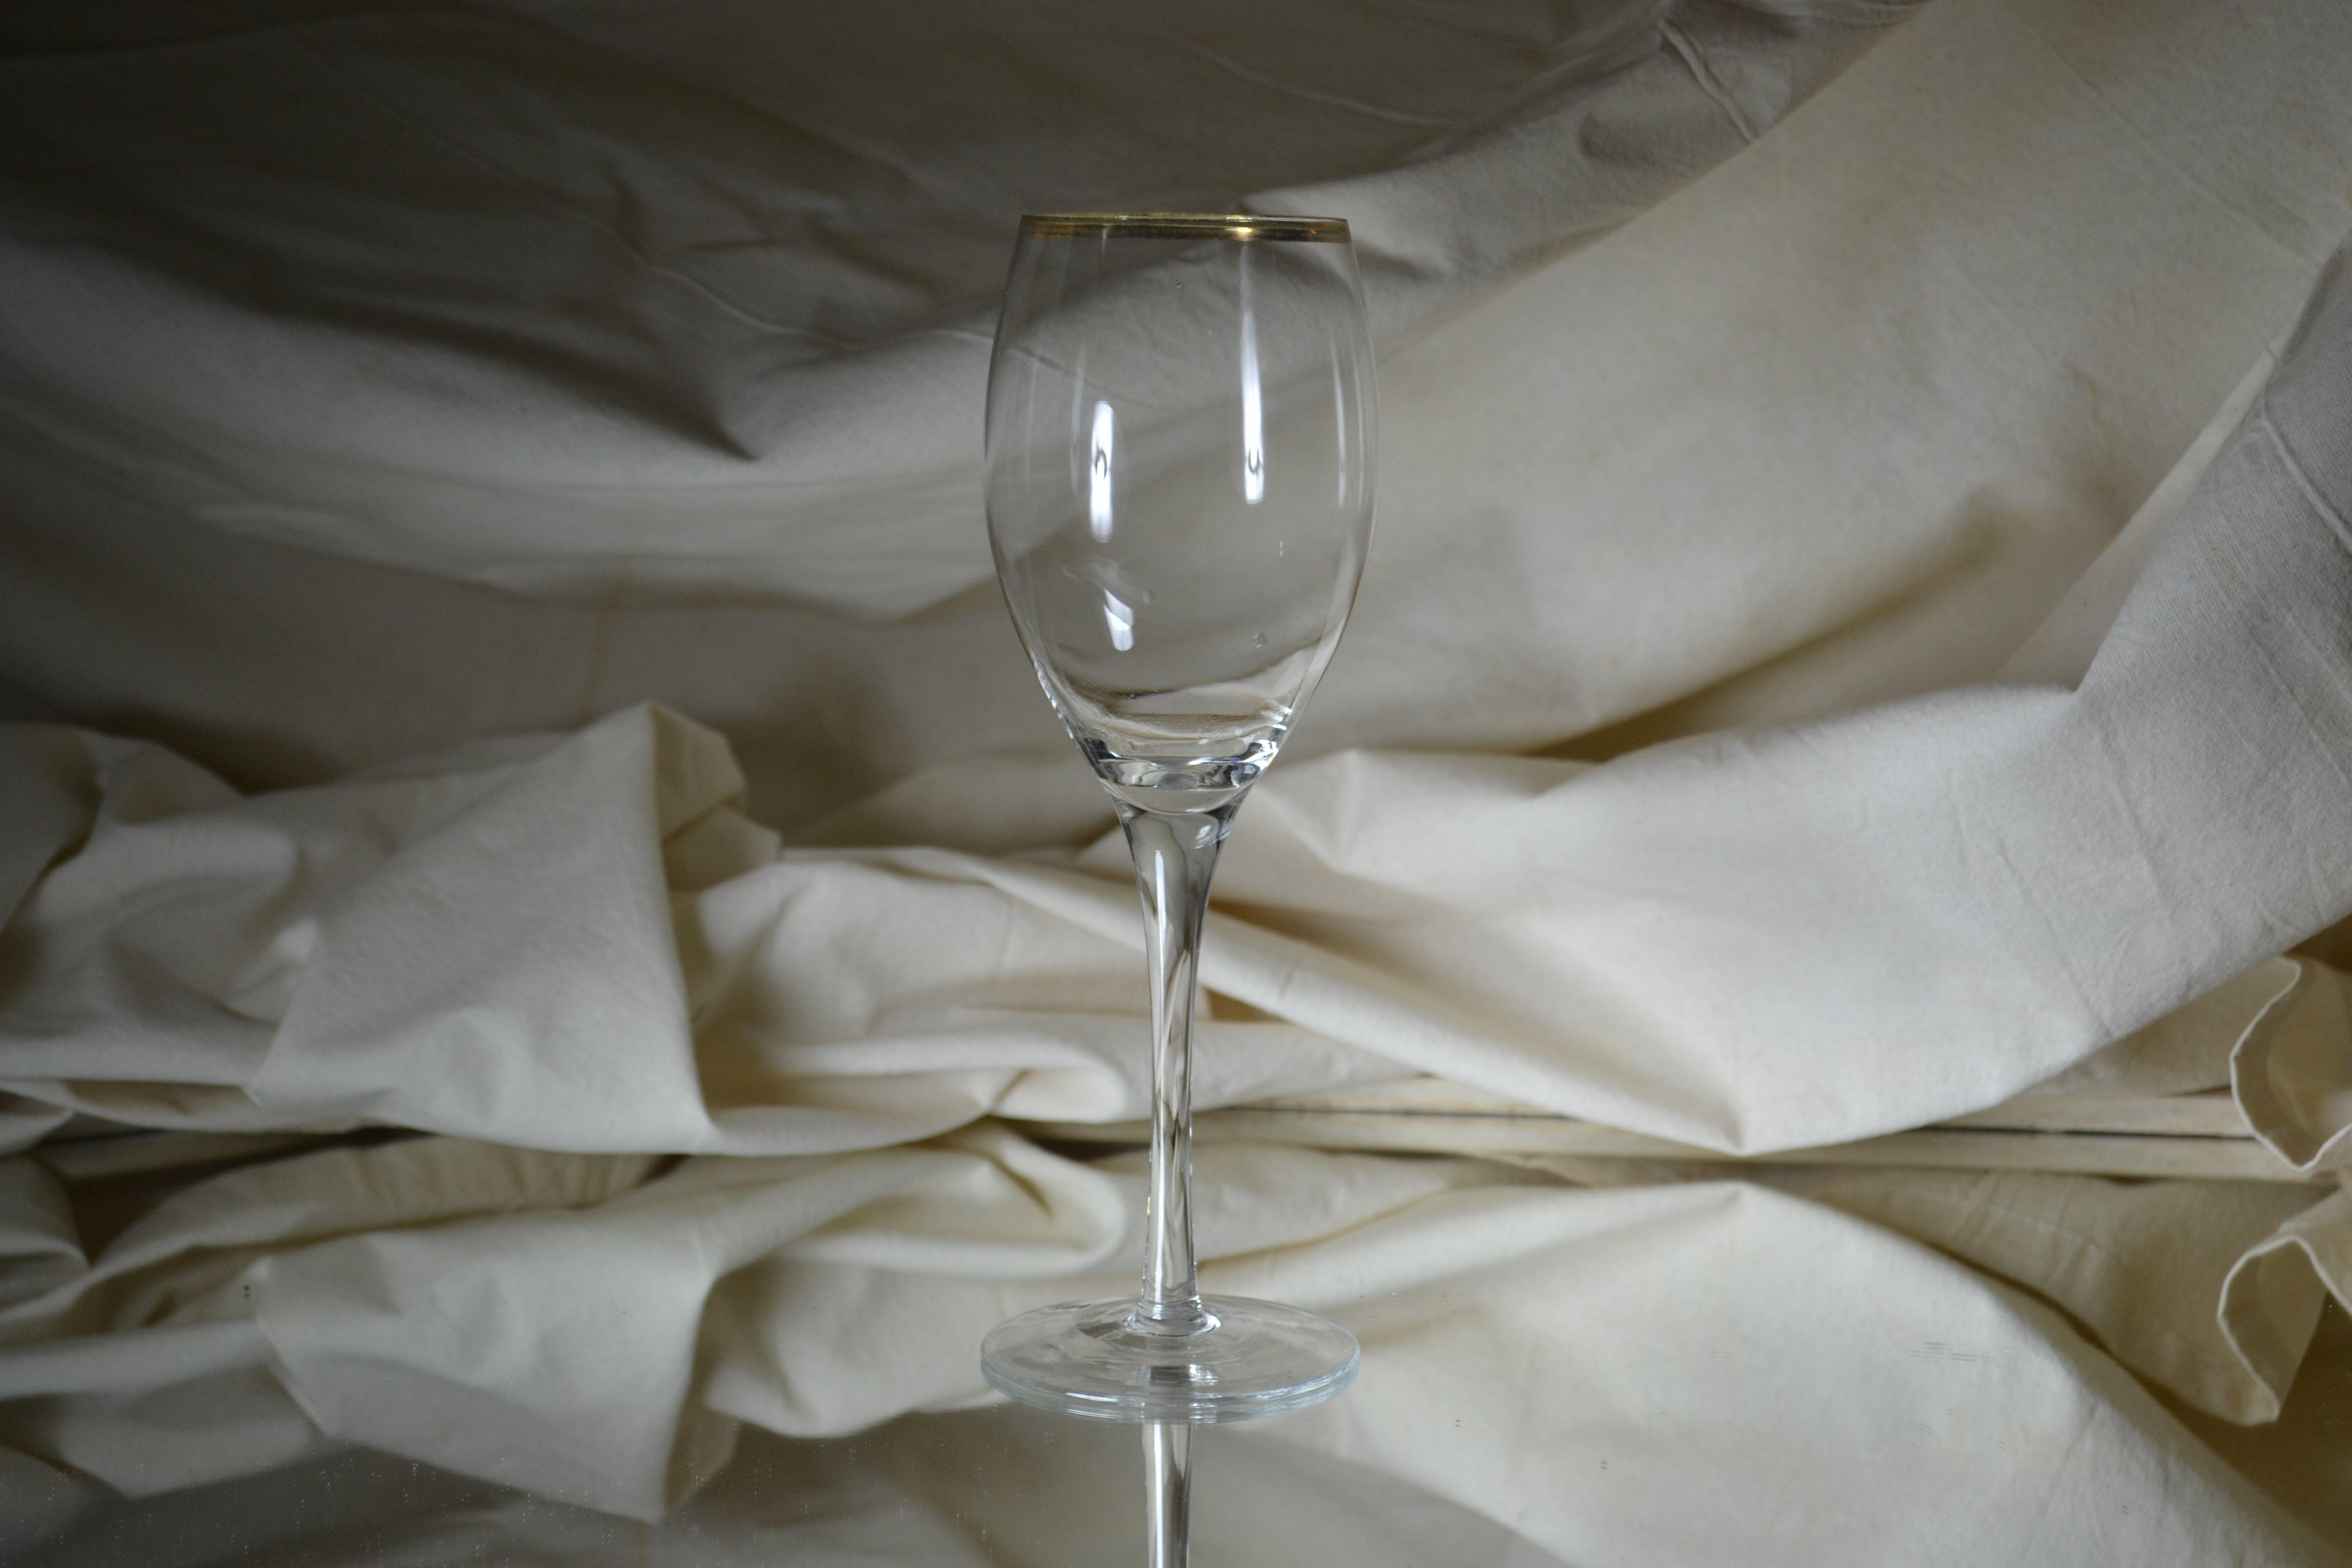 Clear Flute Glass Near White Cloth